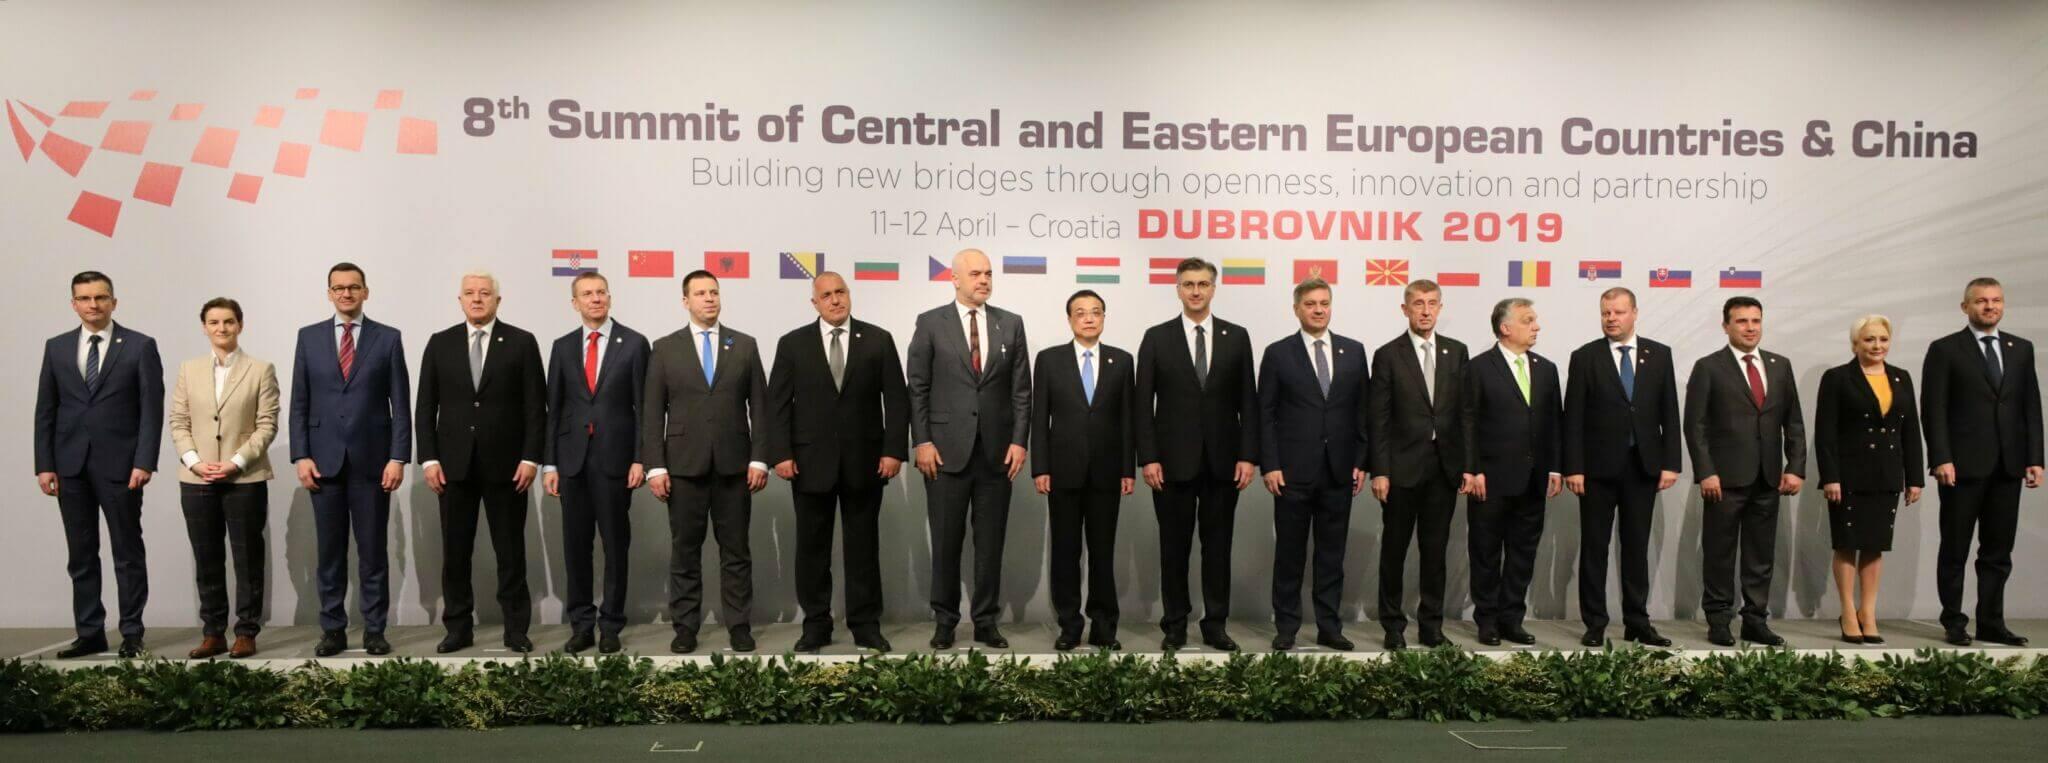 "Naredna faza u odnosima Kine i Centralne i Istočne Evrope: ACT strategija za prevazilaženje ""prazne priče"""